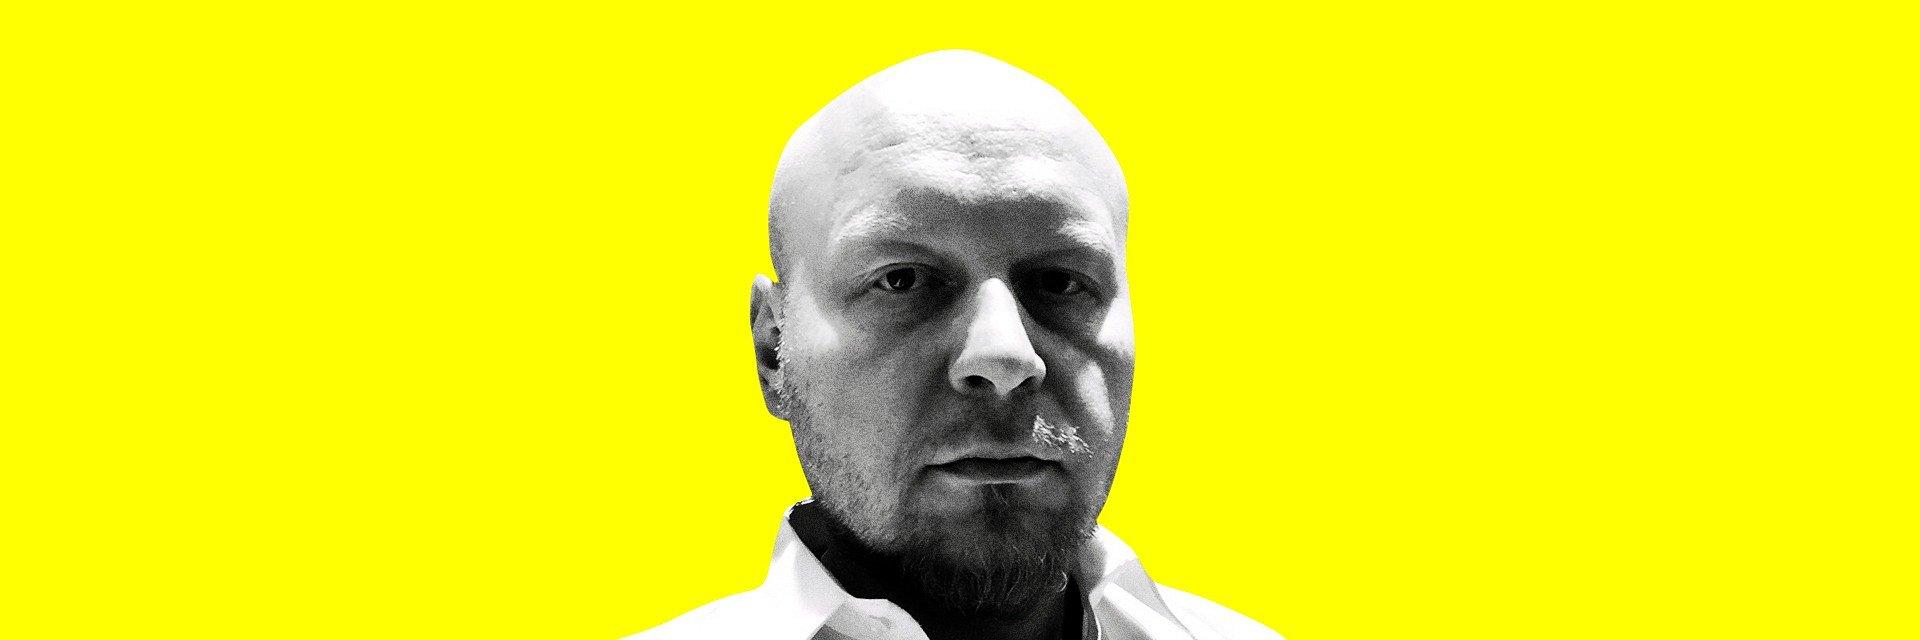 Mariusz Pitura Creative Group Head w Scholz & Friends Warszawa (Grupa S/F)